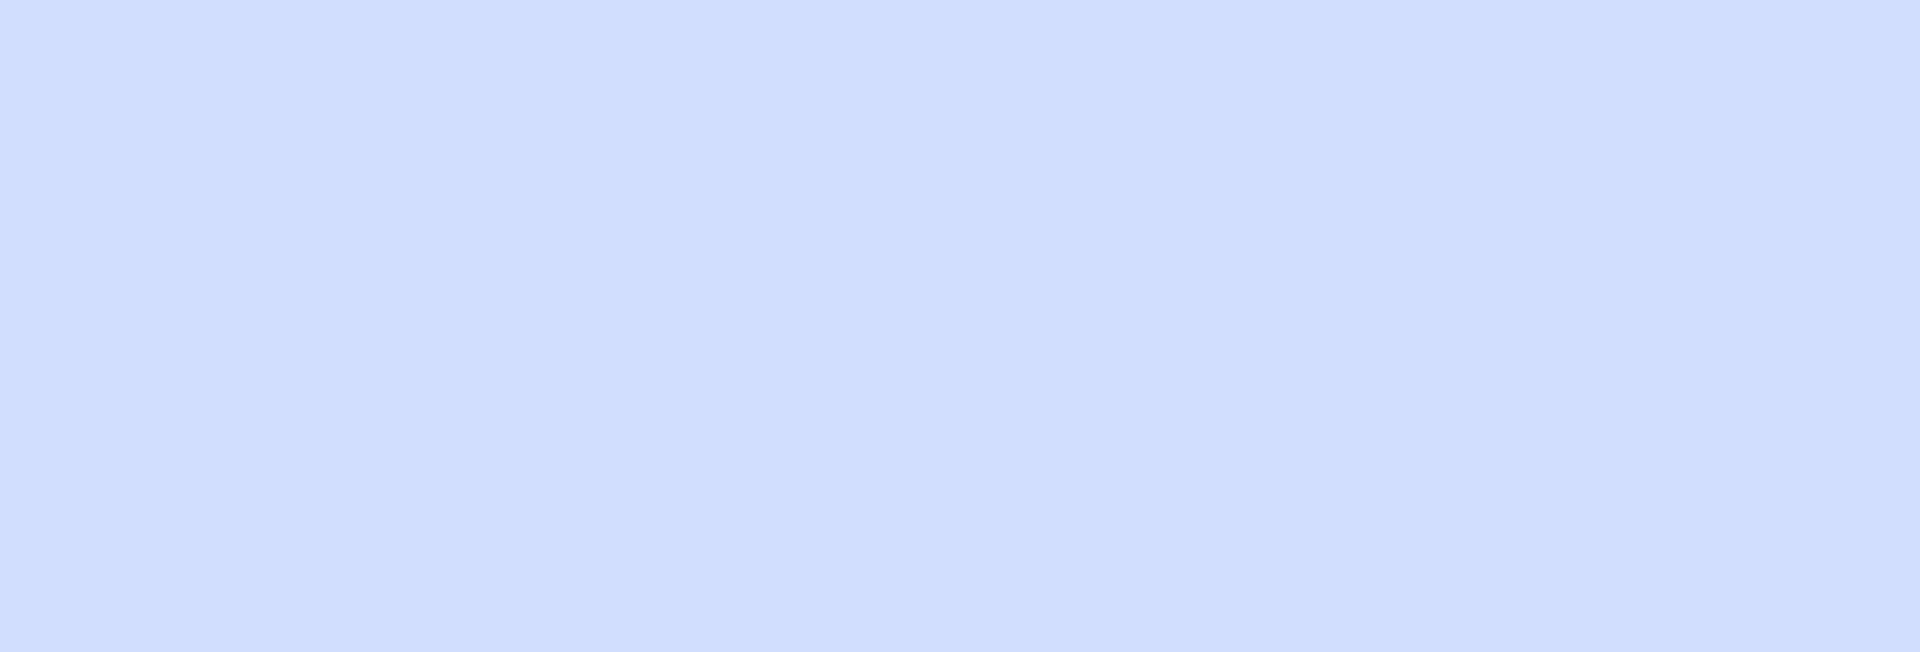 https://www.silberwerk.de/media/image/93/49/5b/KategorieBanner_SALE_farbe.jpg